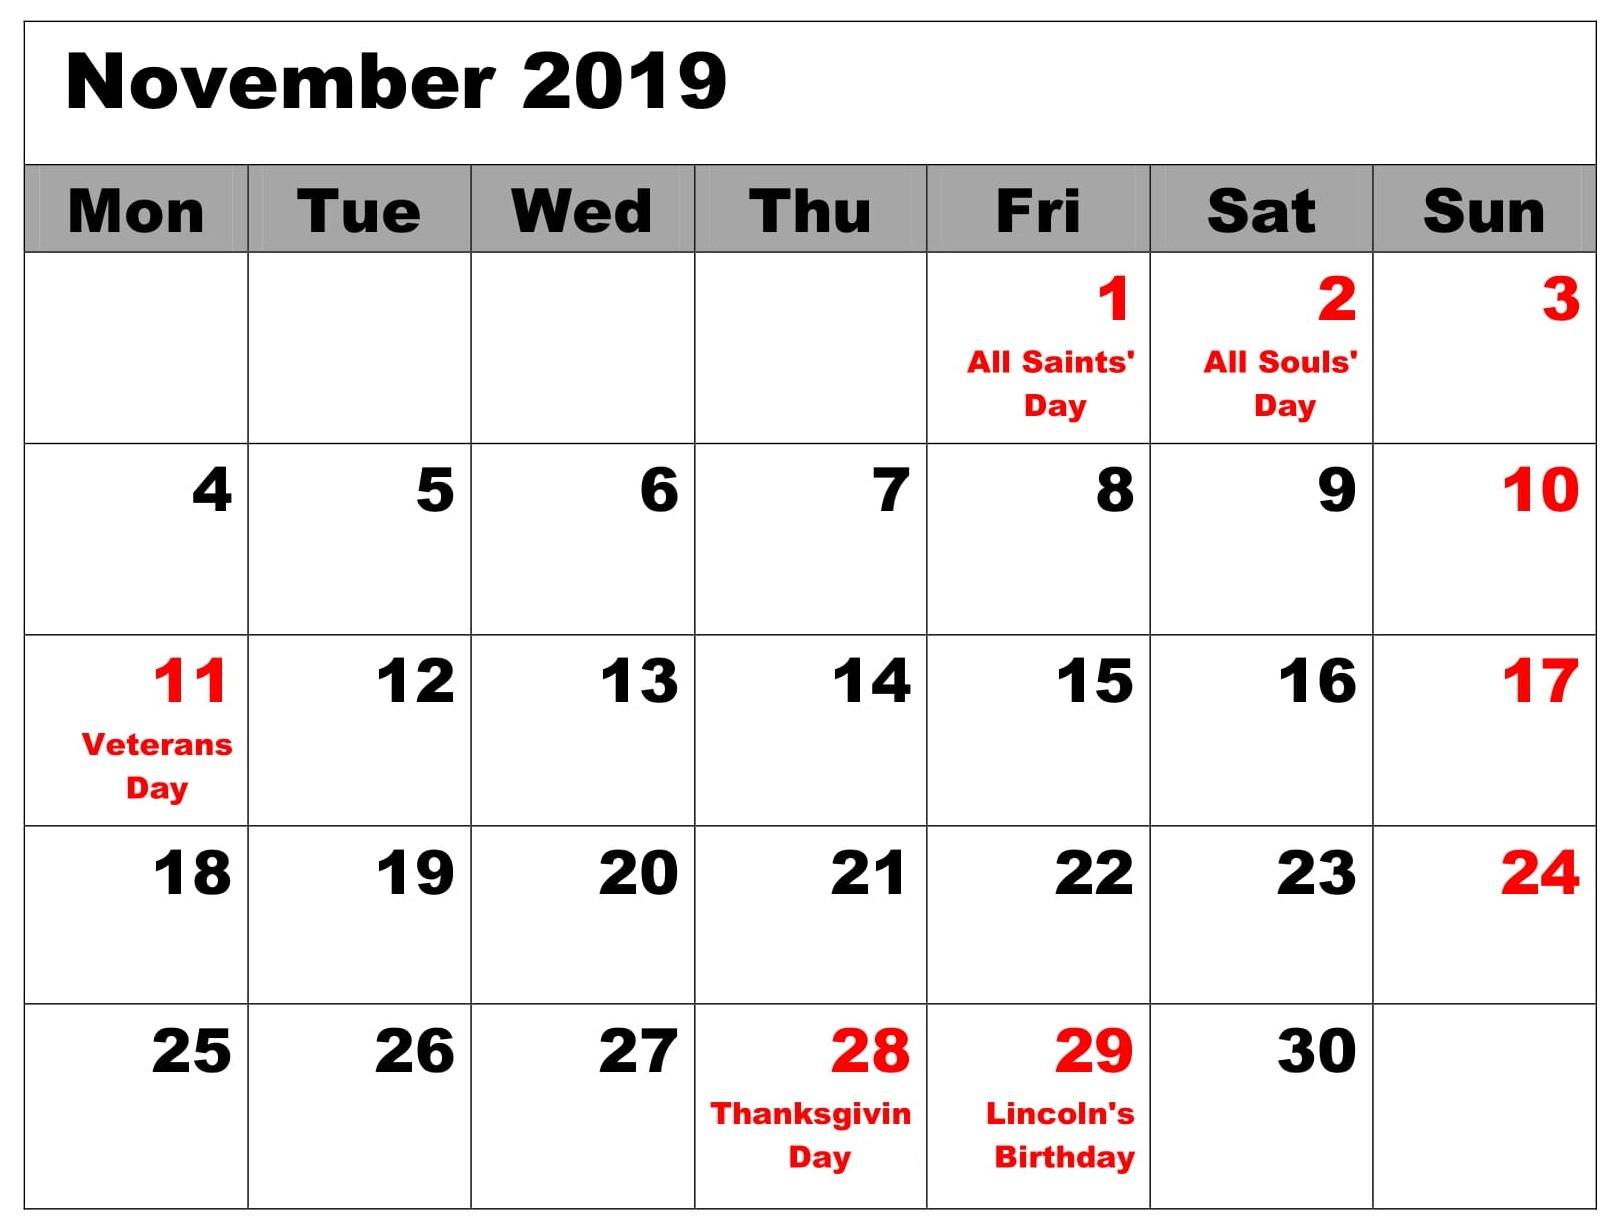 Free November 2019 Calendar With Holidays